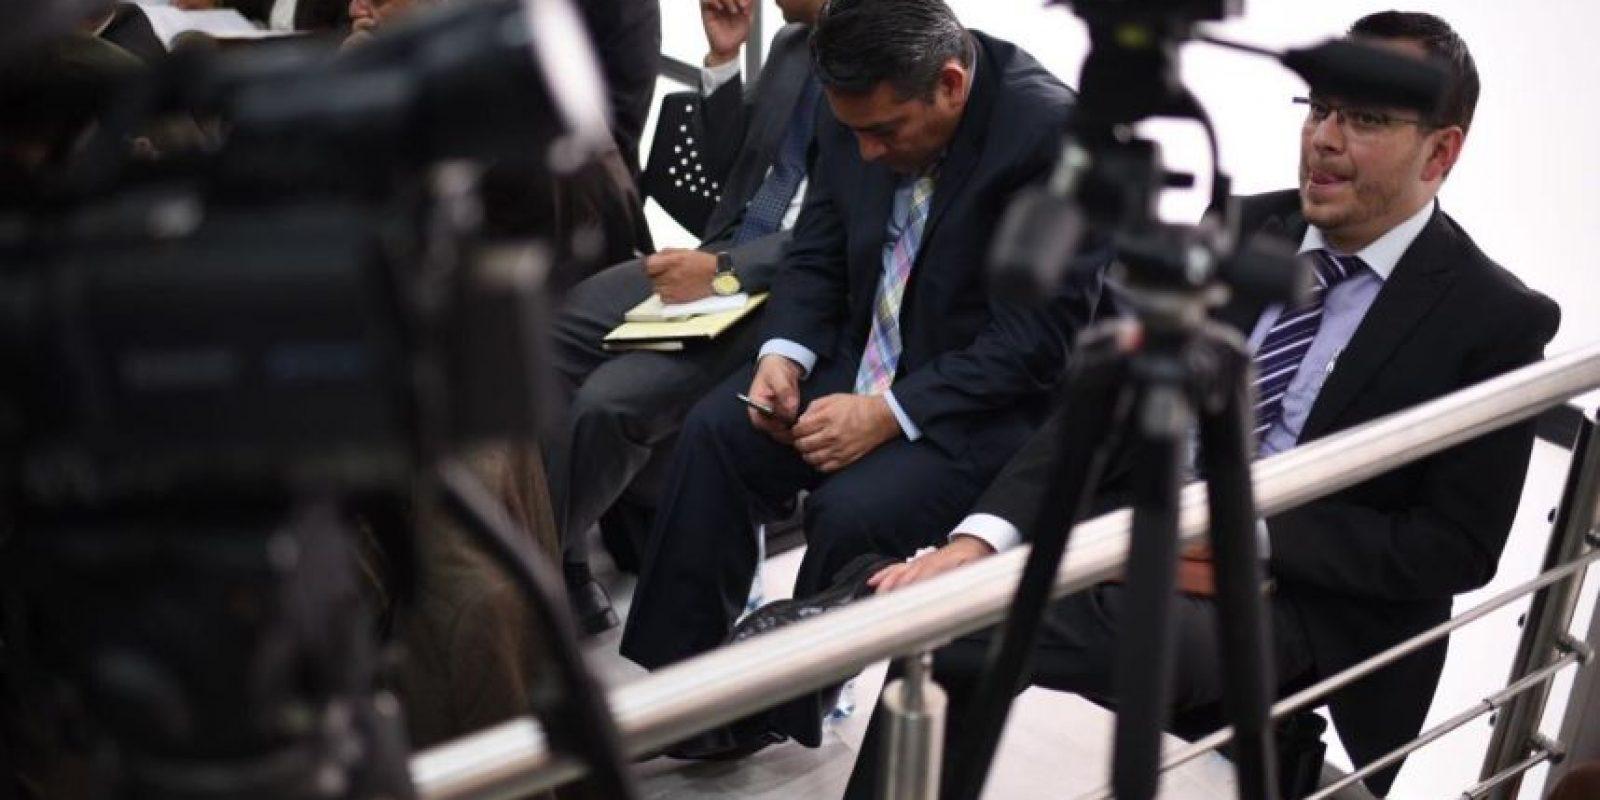 Edgar René Cristiani Calderon aprovechó para revisar un celular en la audiencia. Foto:Publinews